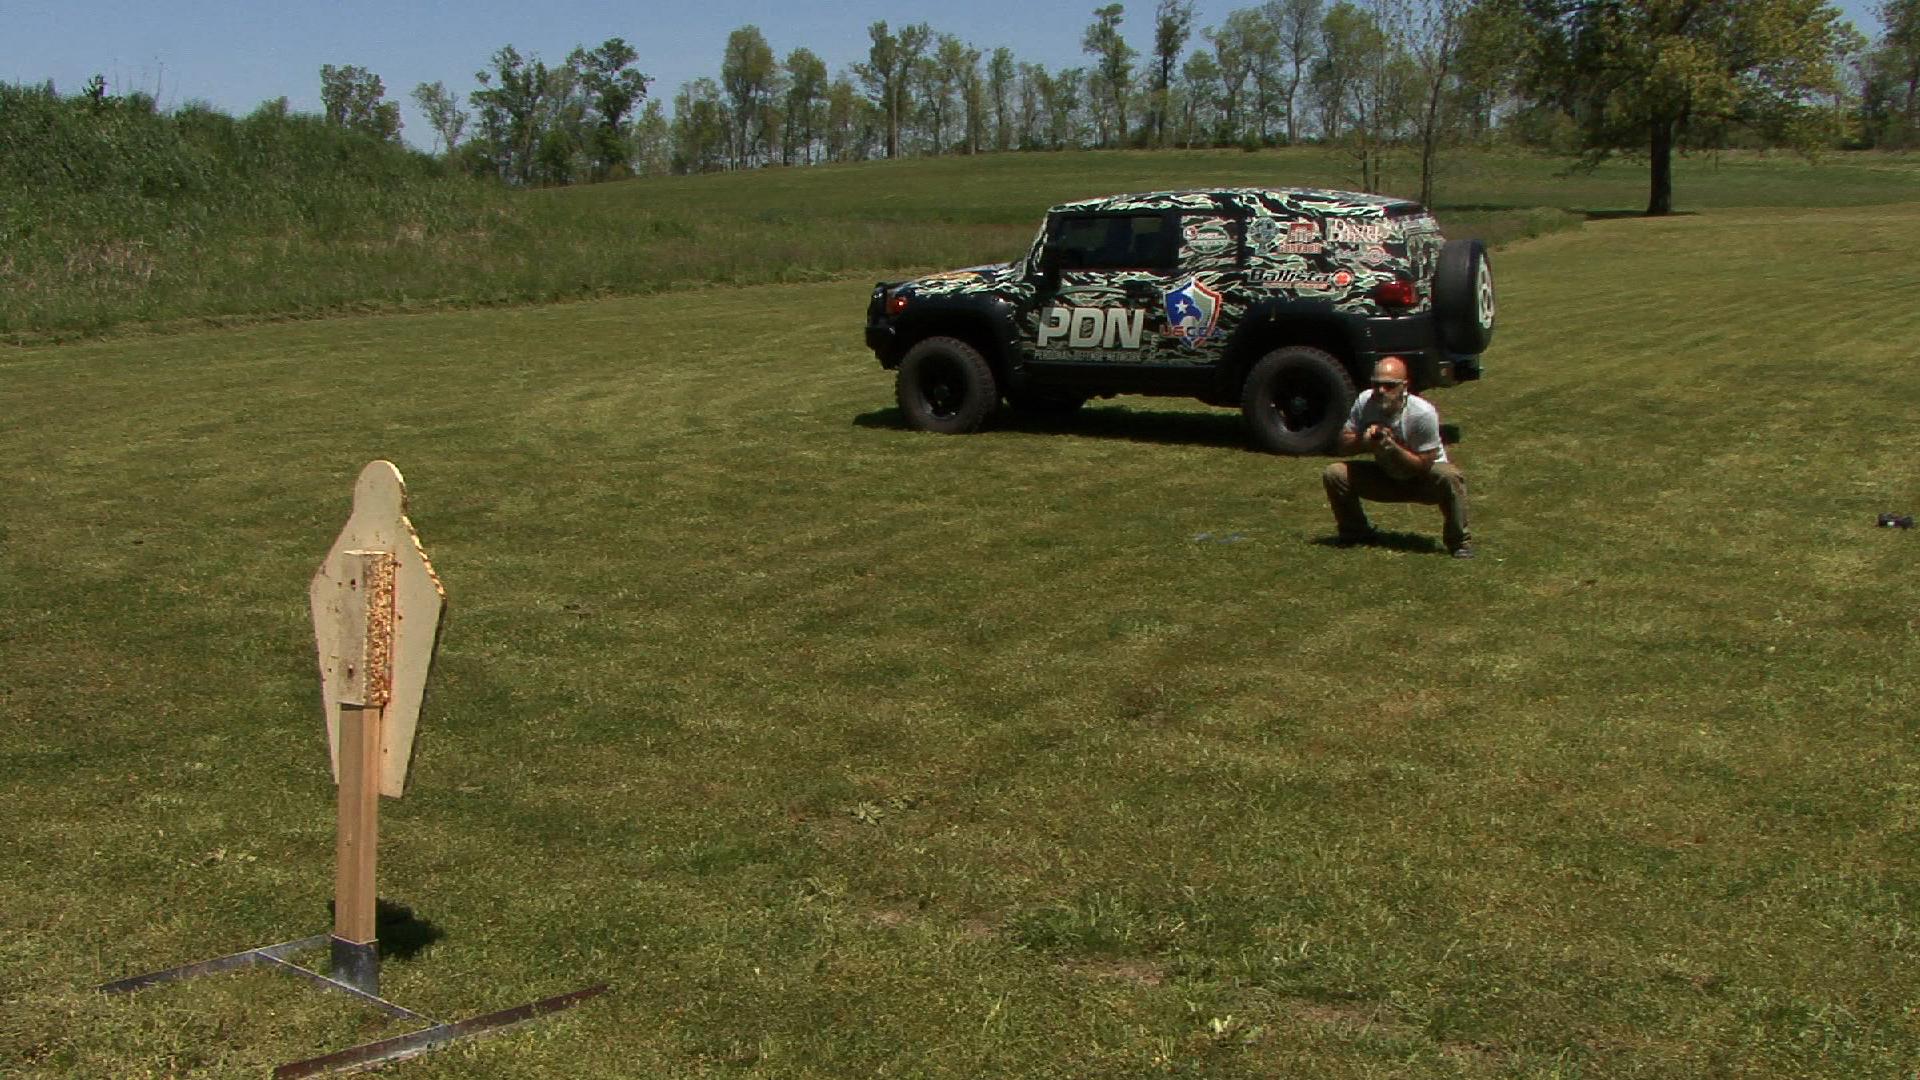 Fitshot Air Squats for Handgun Training